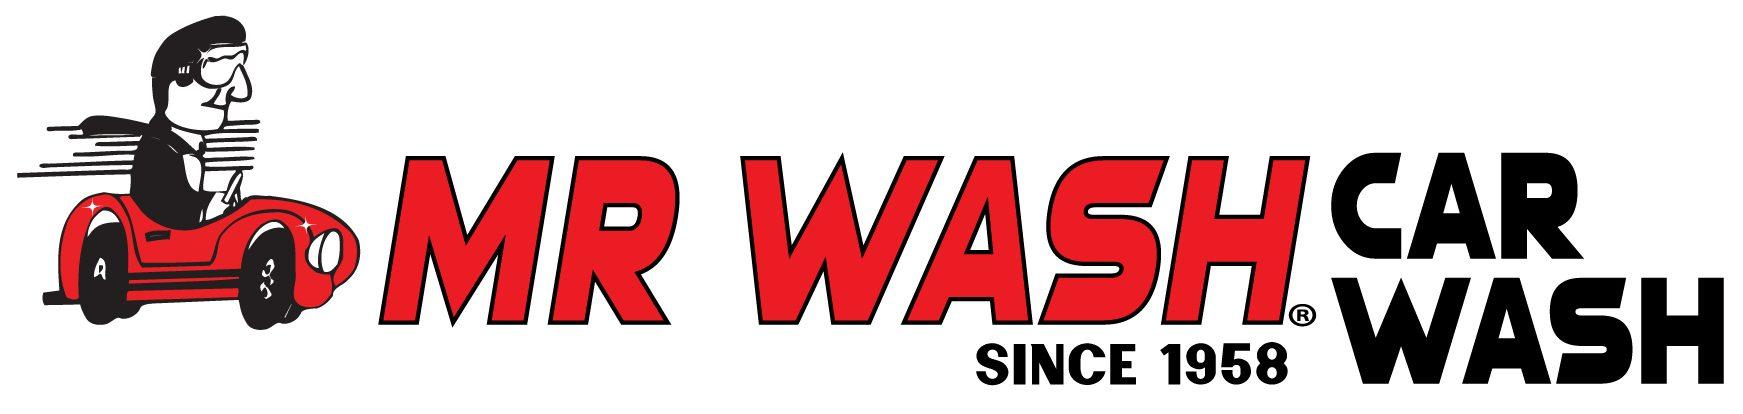 Mr Wash Car Wash